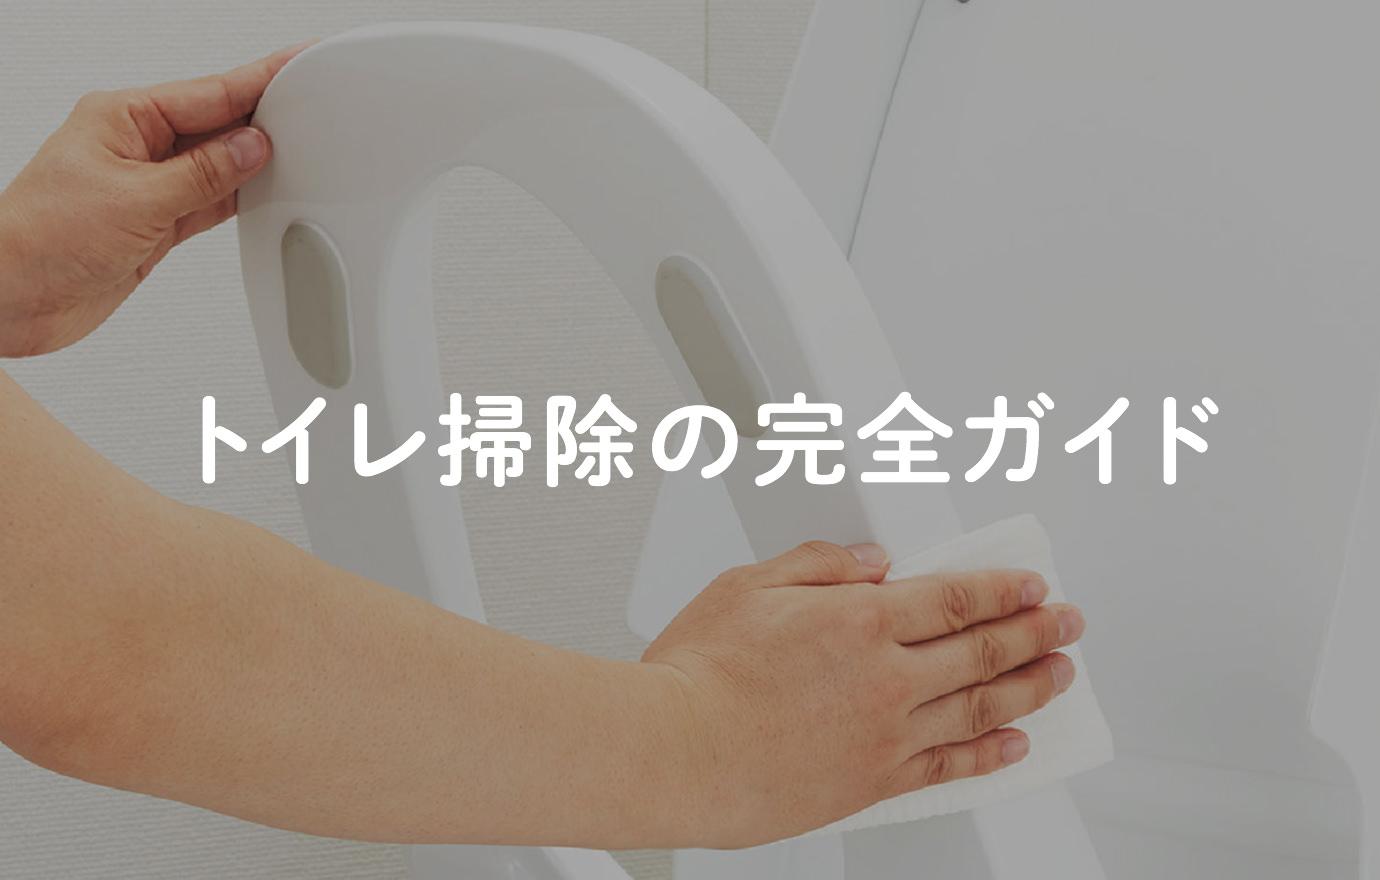 LIXILが教える! トイレ掃除まるわかりガイド